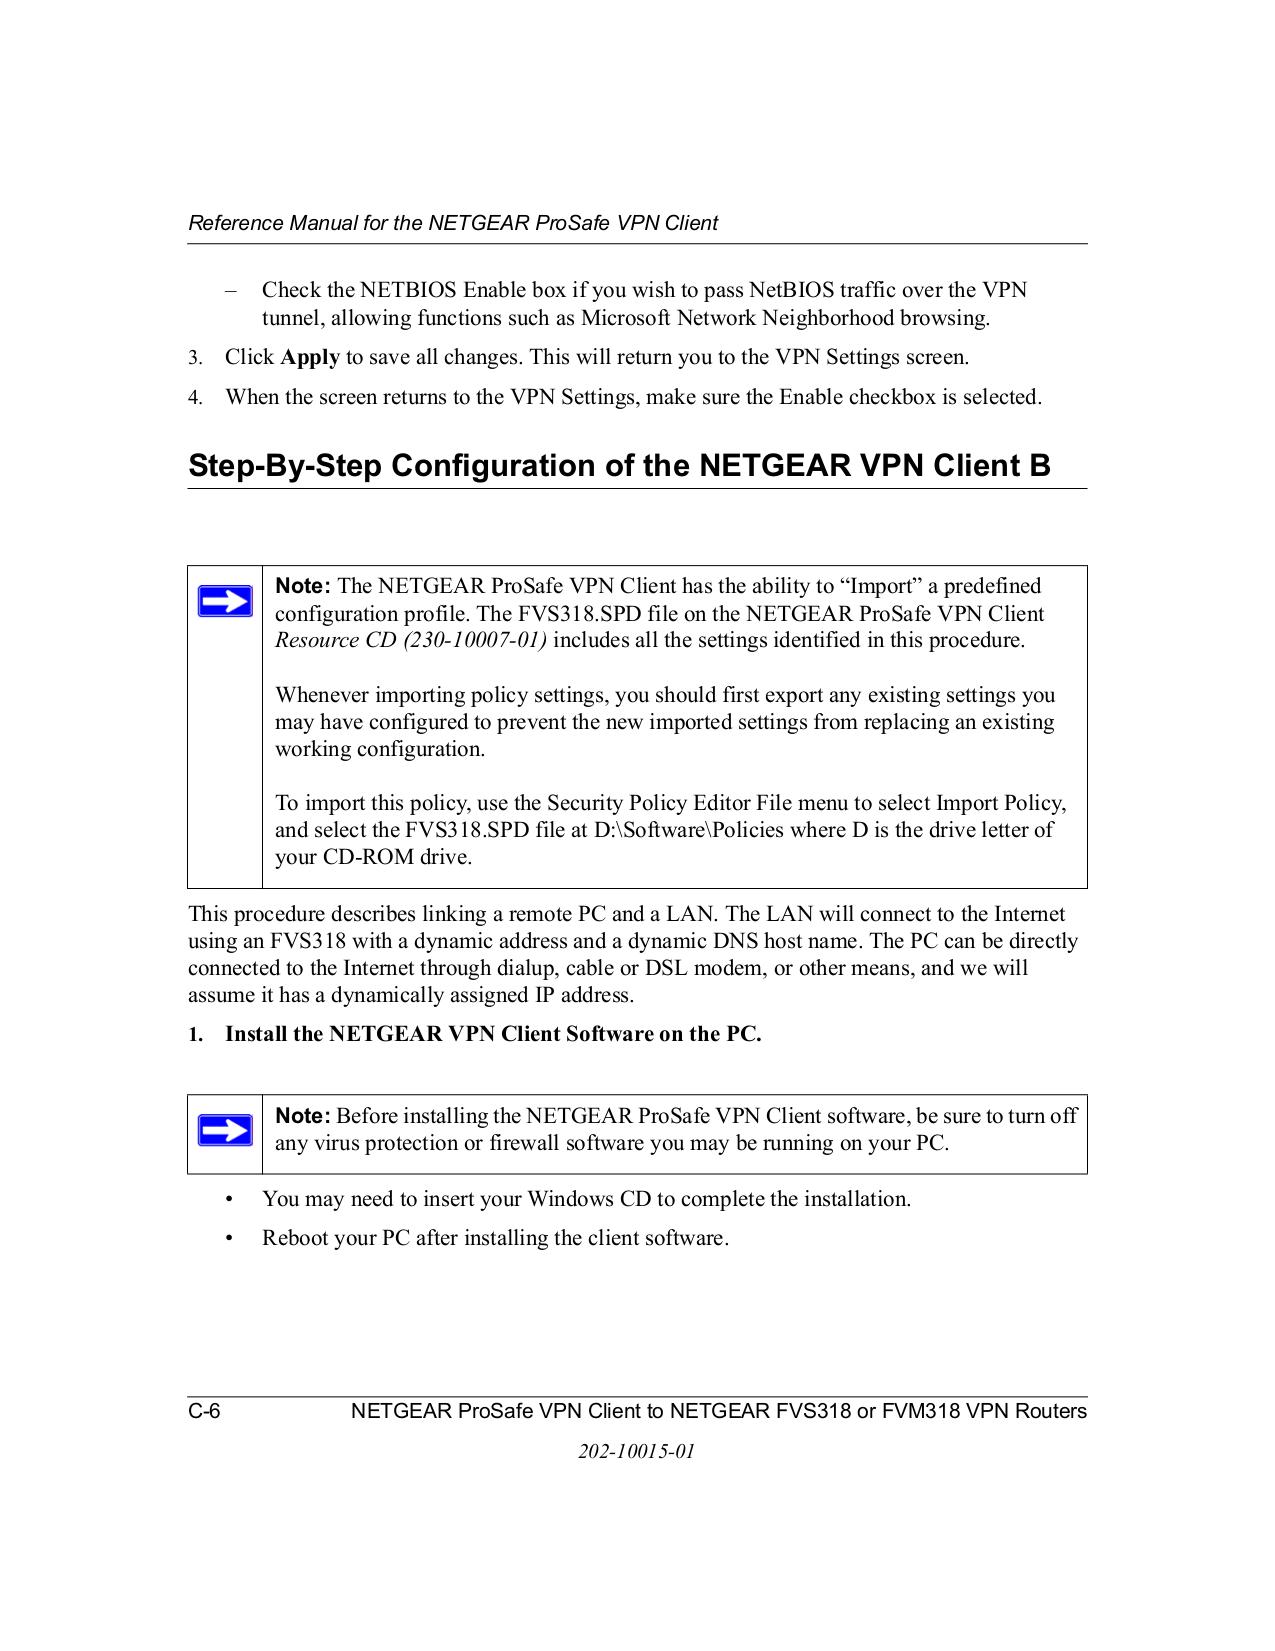 PDF manual for Netgear Router ProSafe FVS318G